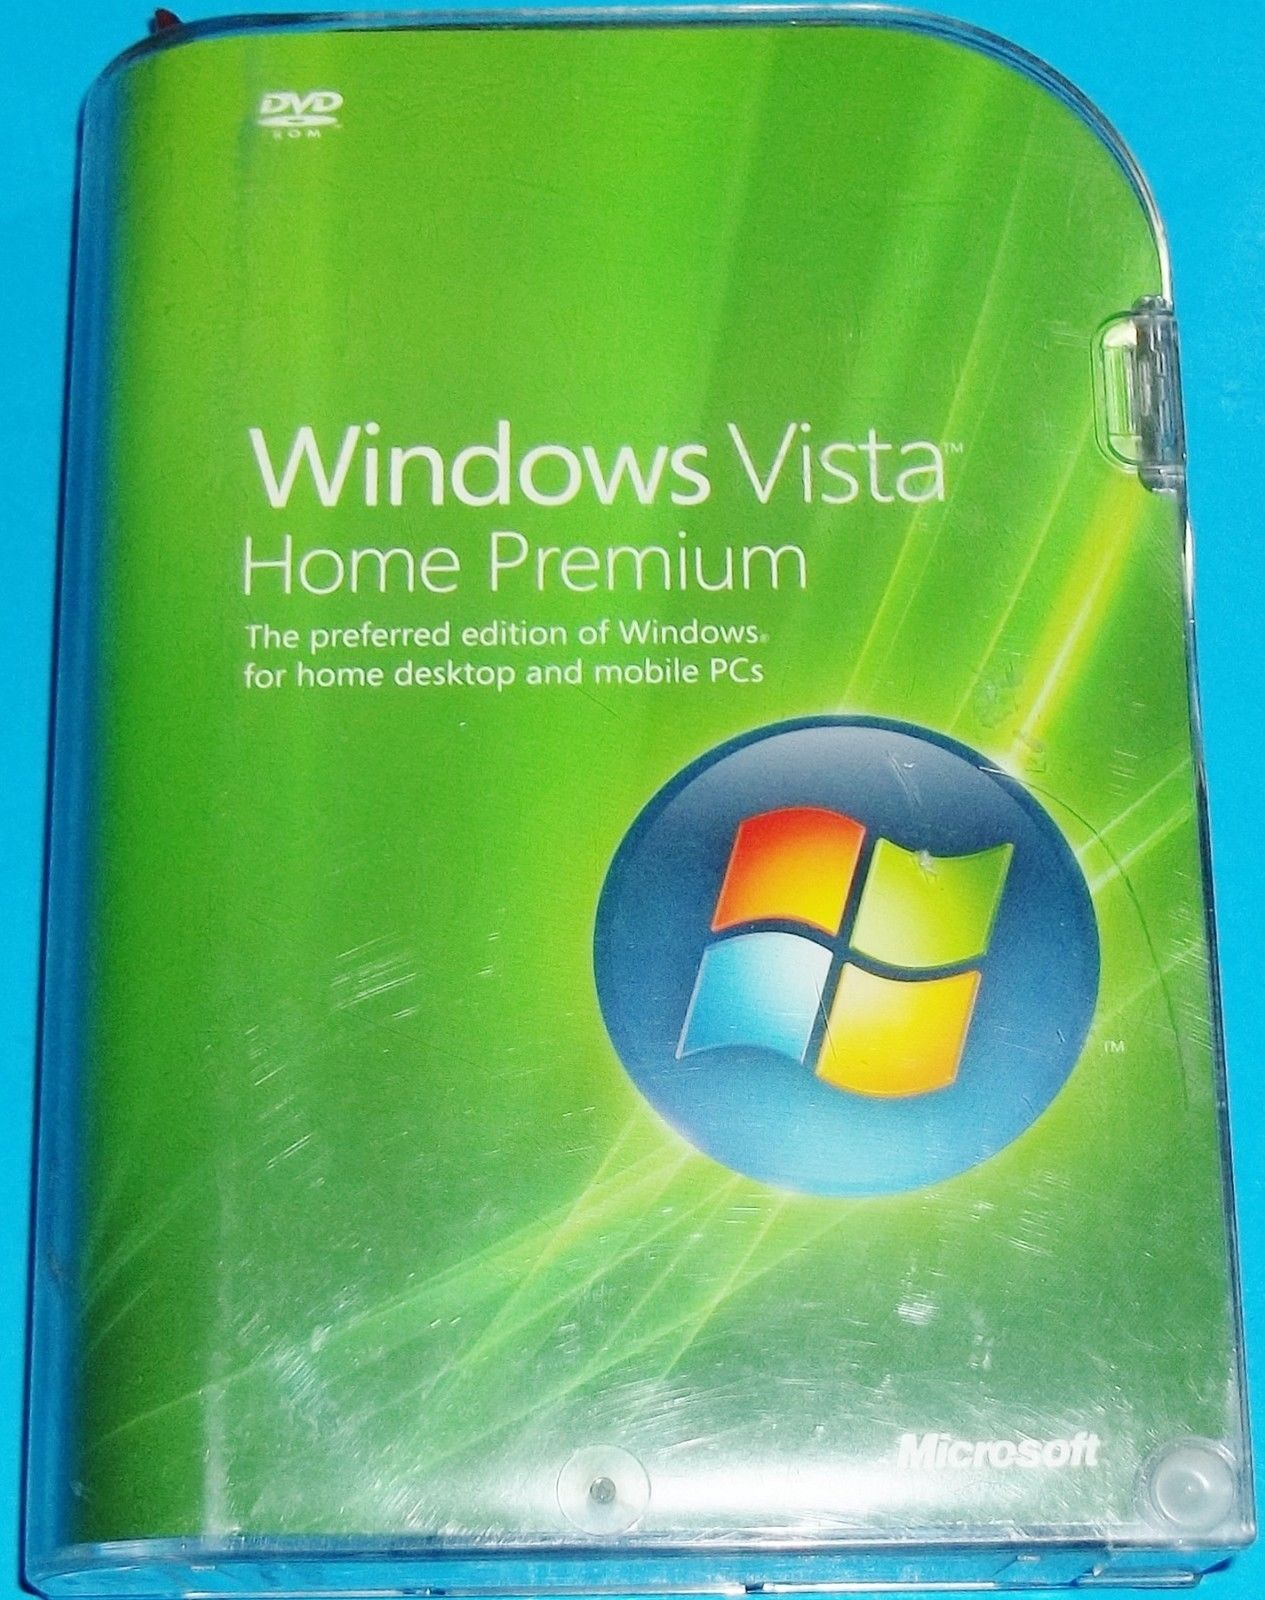 activation key for windows vista home premium